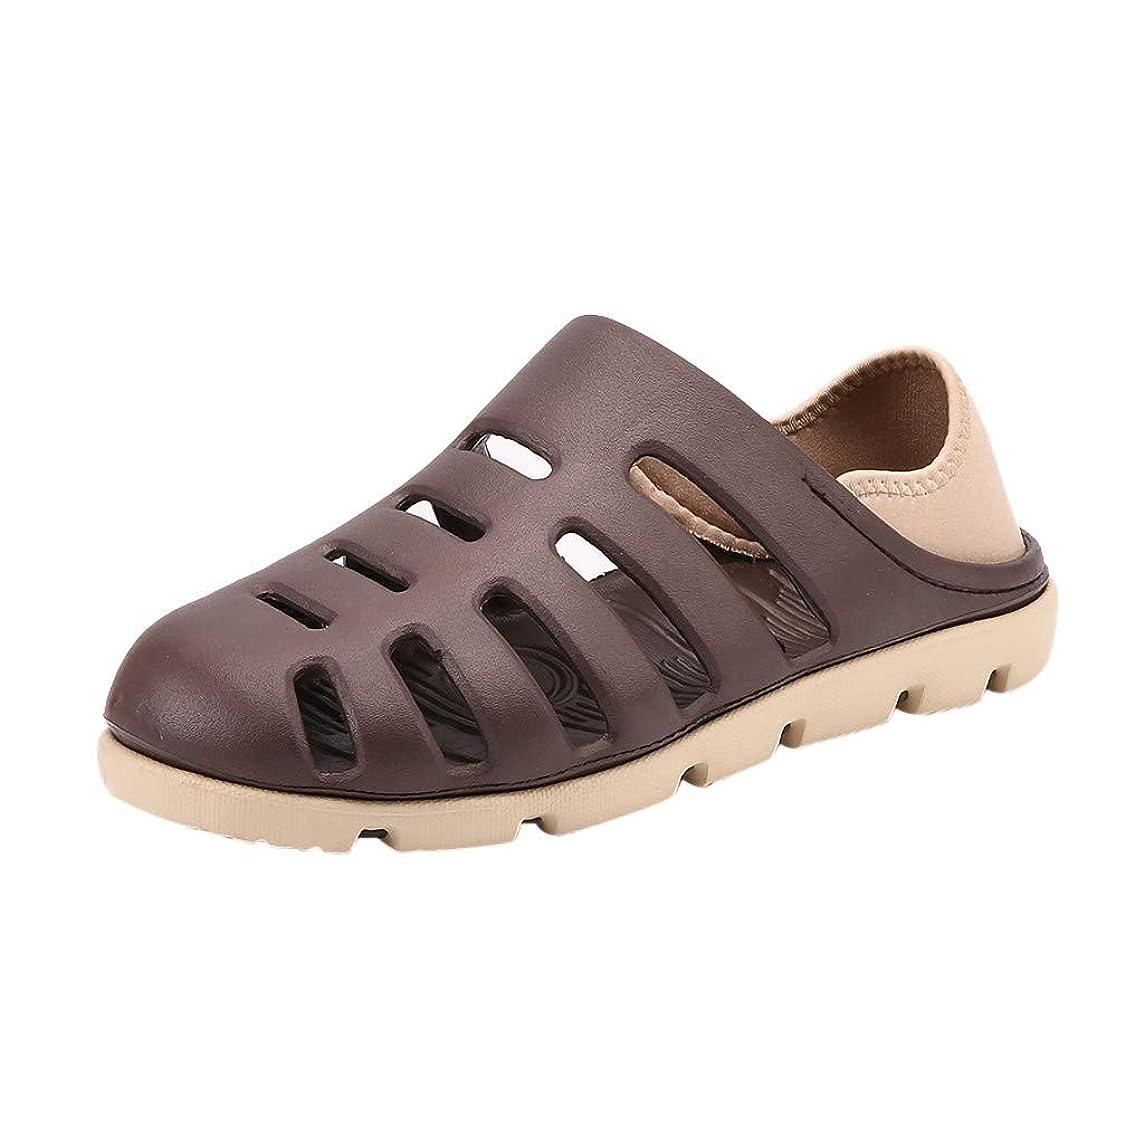 Sunhusing Summer Men's Flat Bottom Breathable Antiskid Light Slippers Beach Hollow-Out Hole Shoes Sandals